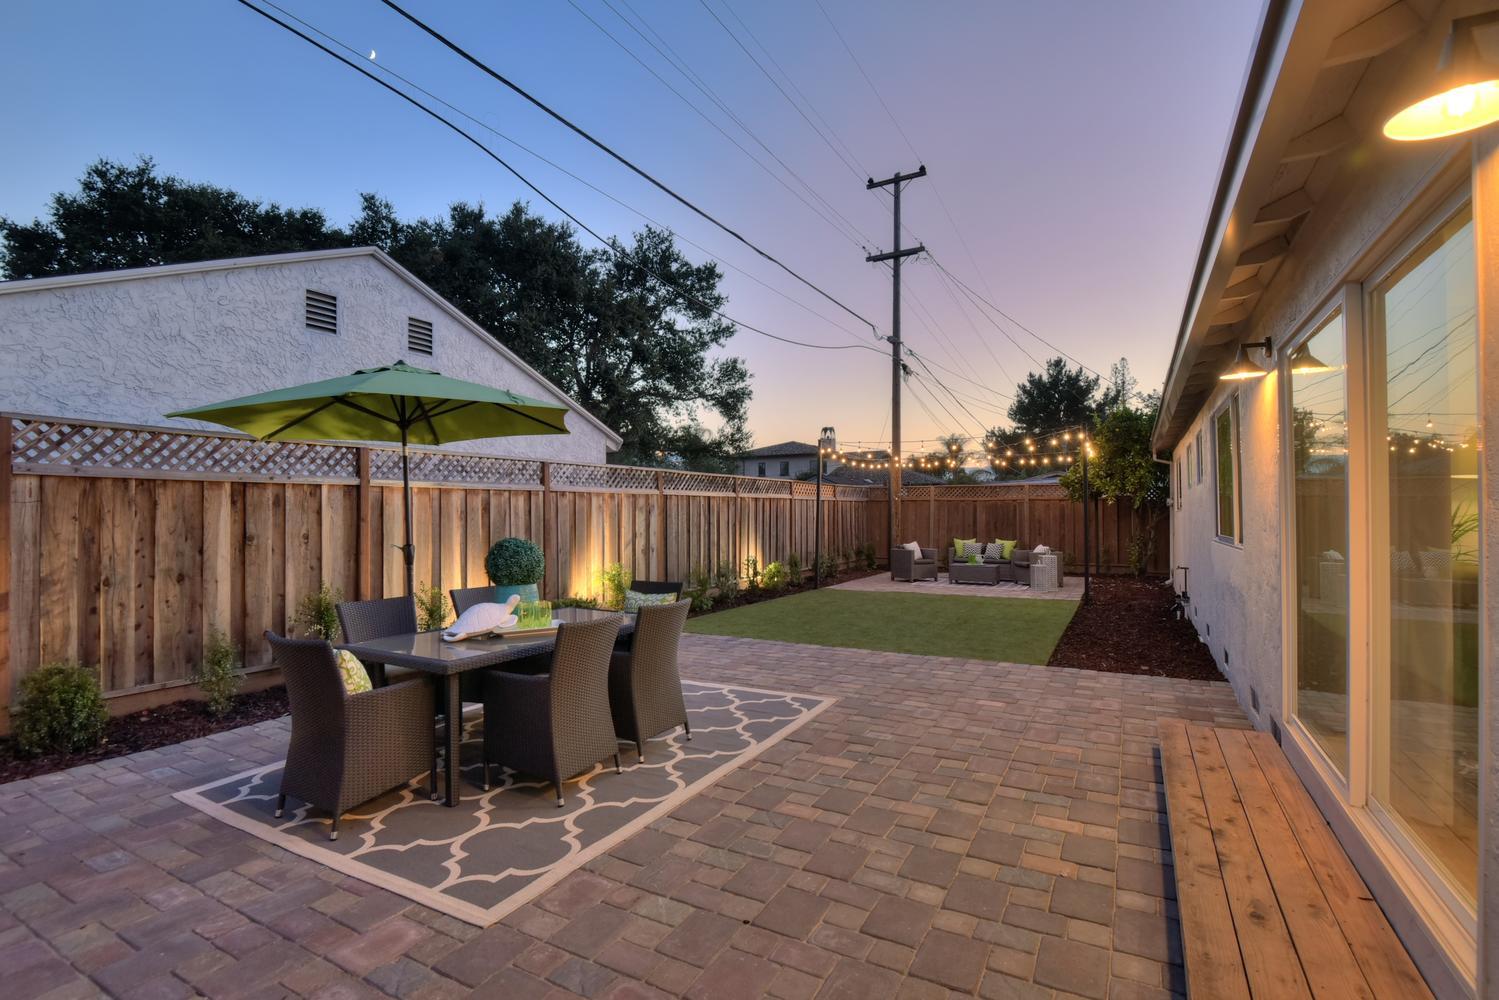 1028 Steinway Ave Campbell CA-large-033-16-Backyard at Dusk-1500x1000-72dpi.jpg